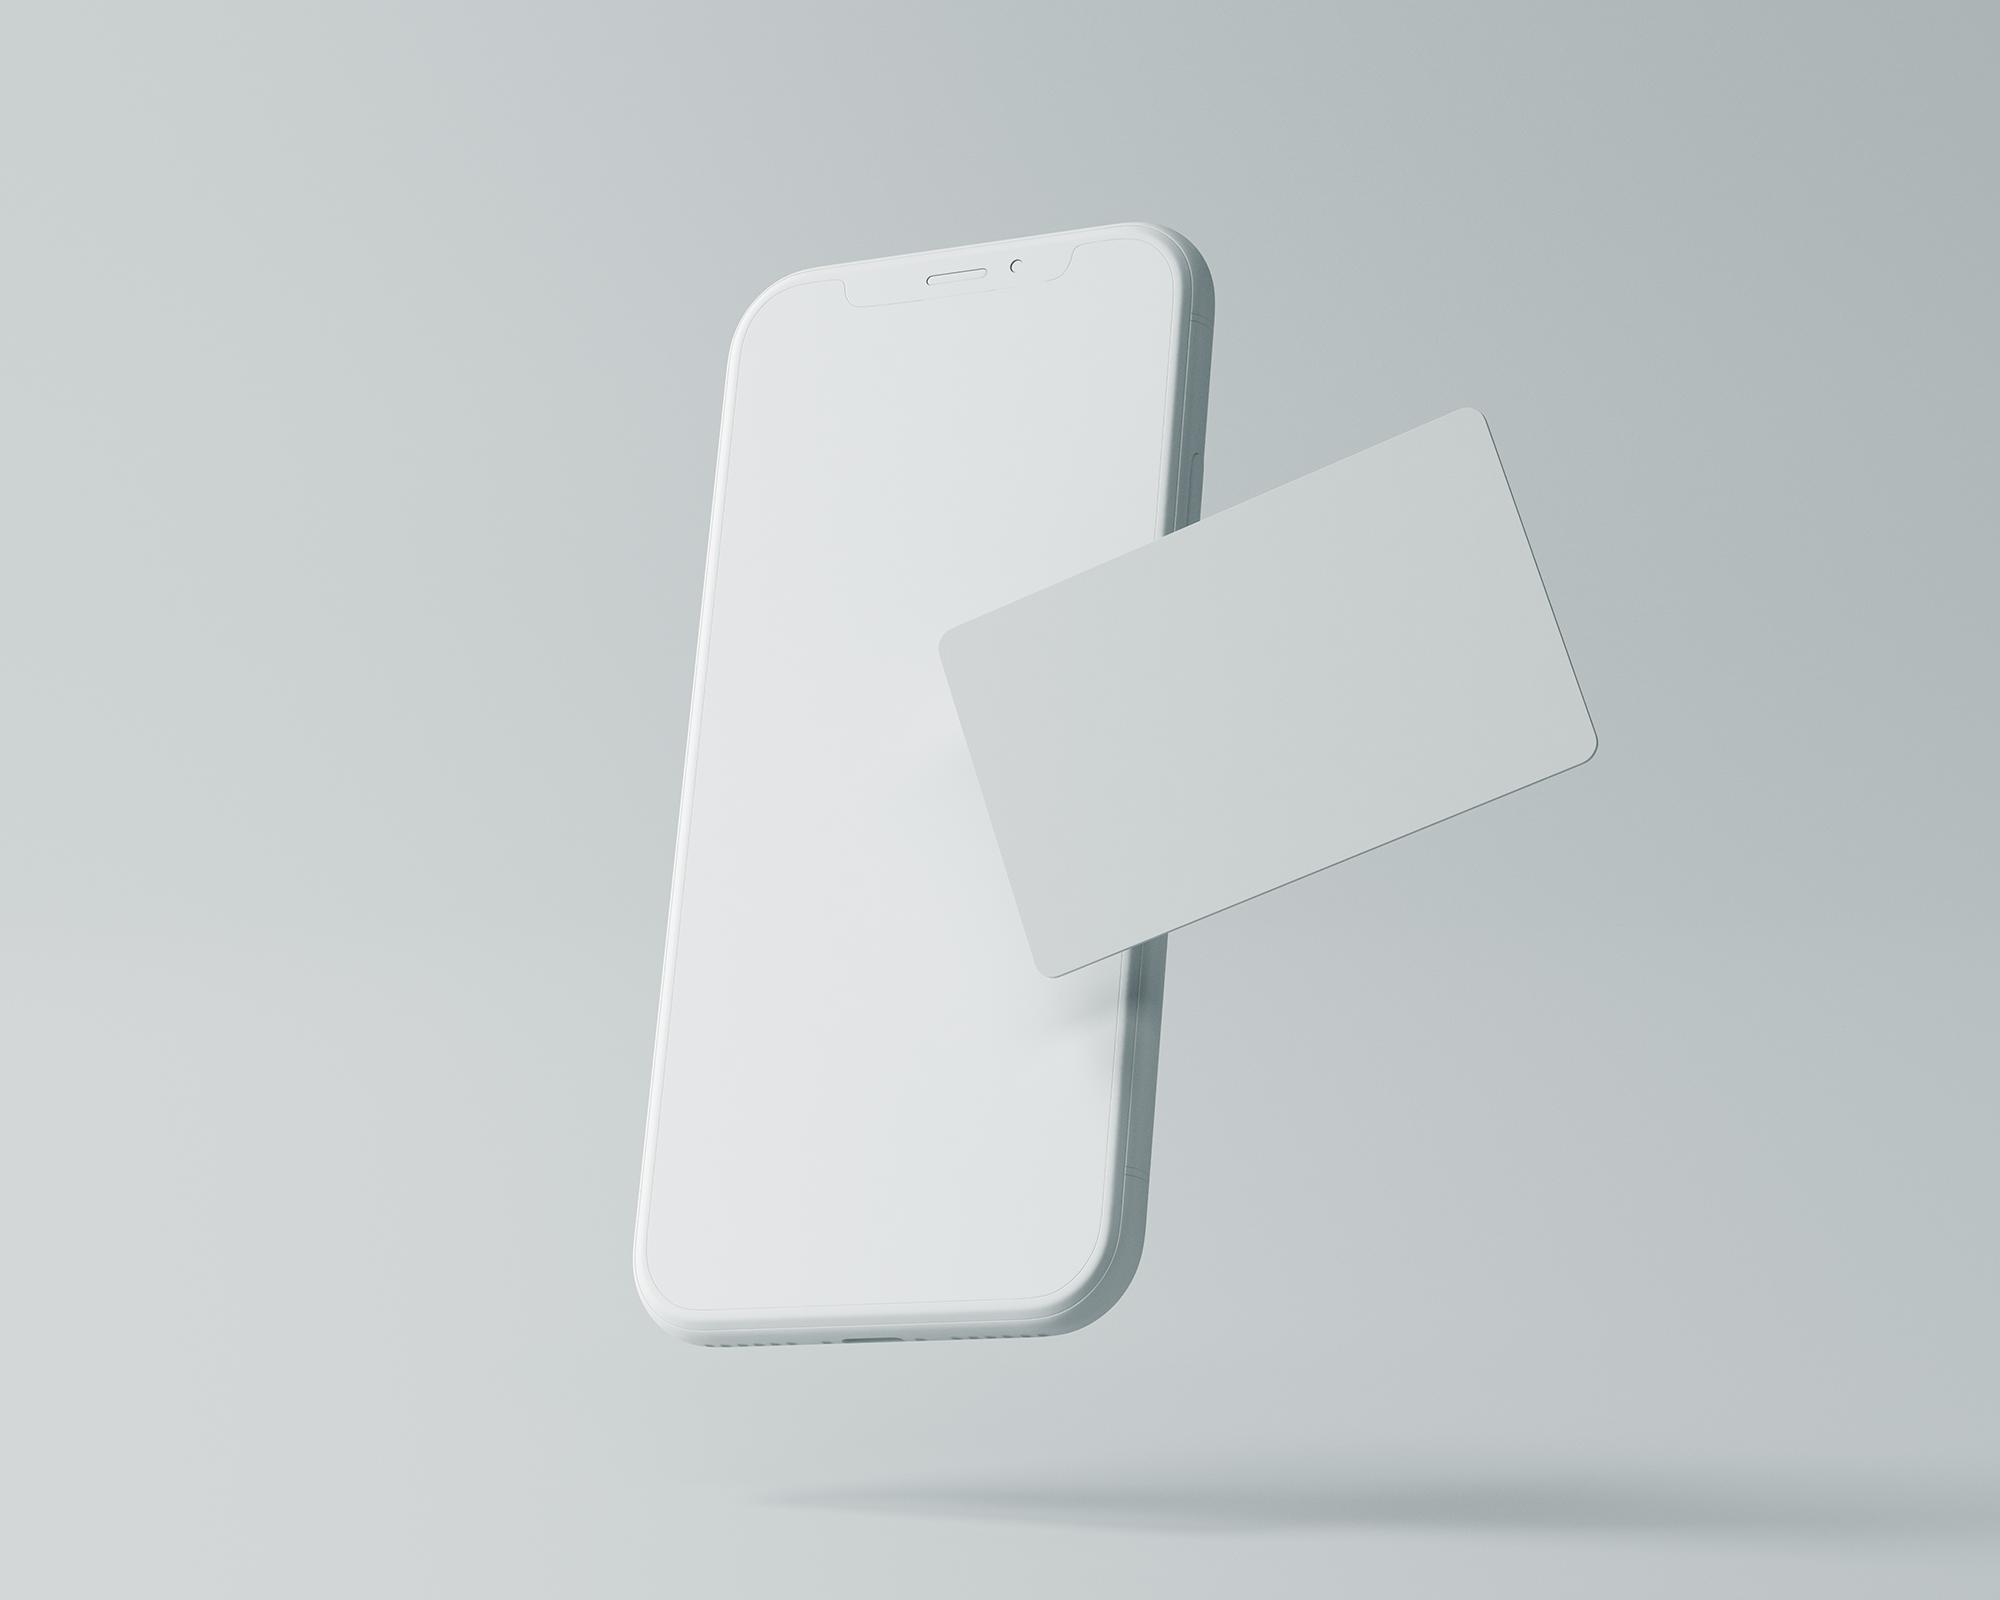 Online Payment Mockup 2